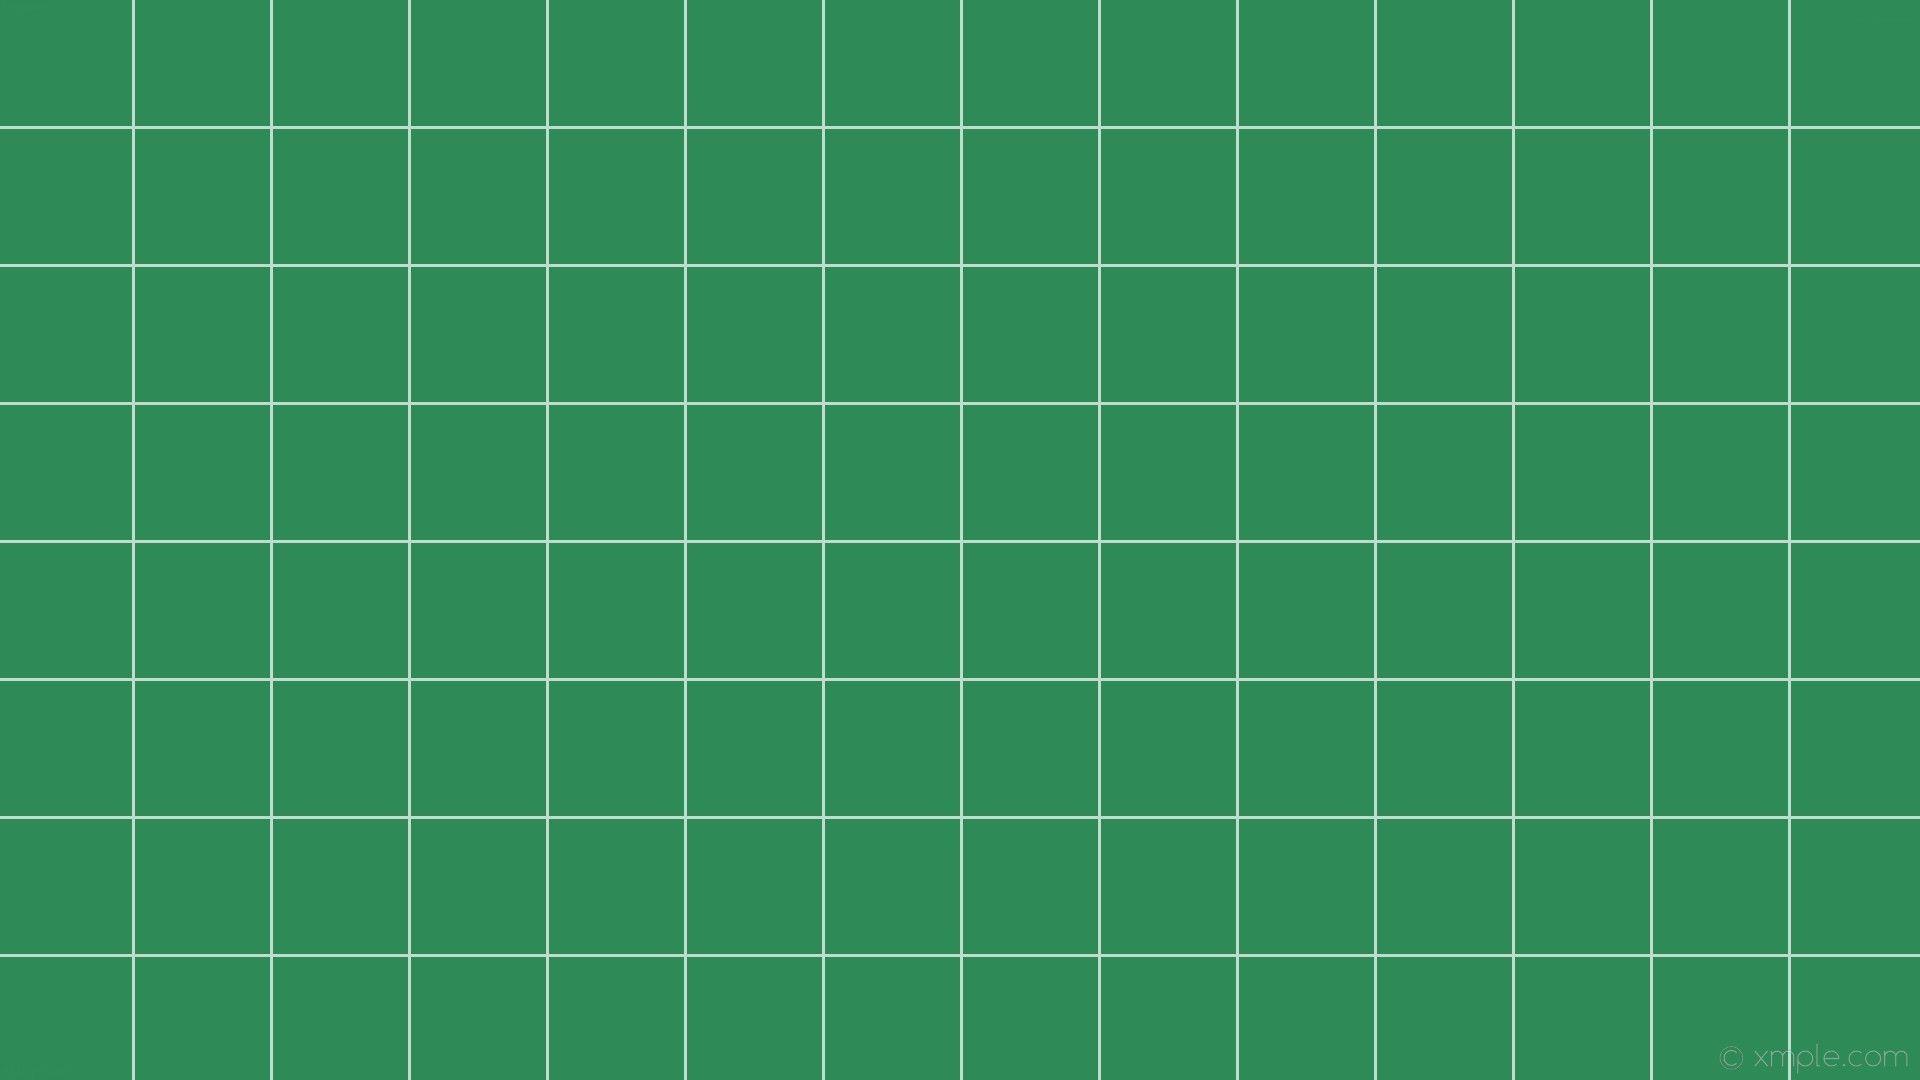 Res: 1920x1080, Black And White Grid Wallpaper Tumblr Unique Grid Wallpaper 70 Images